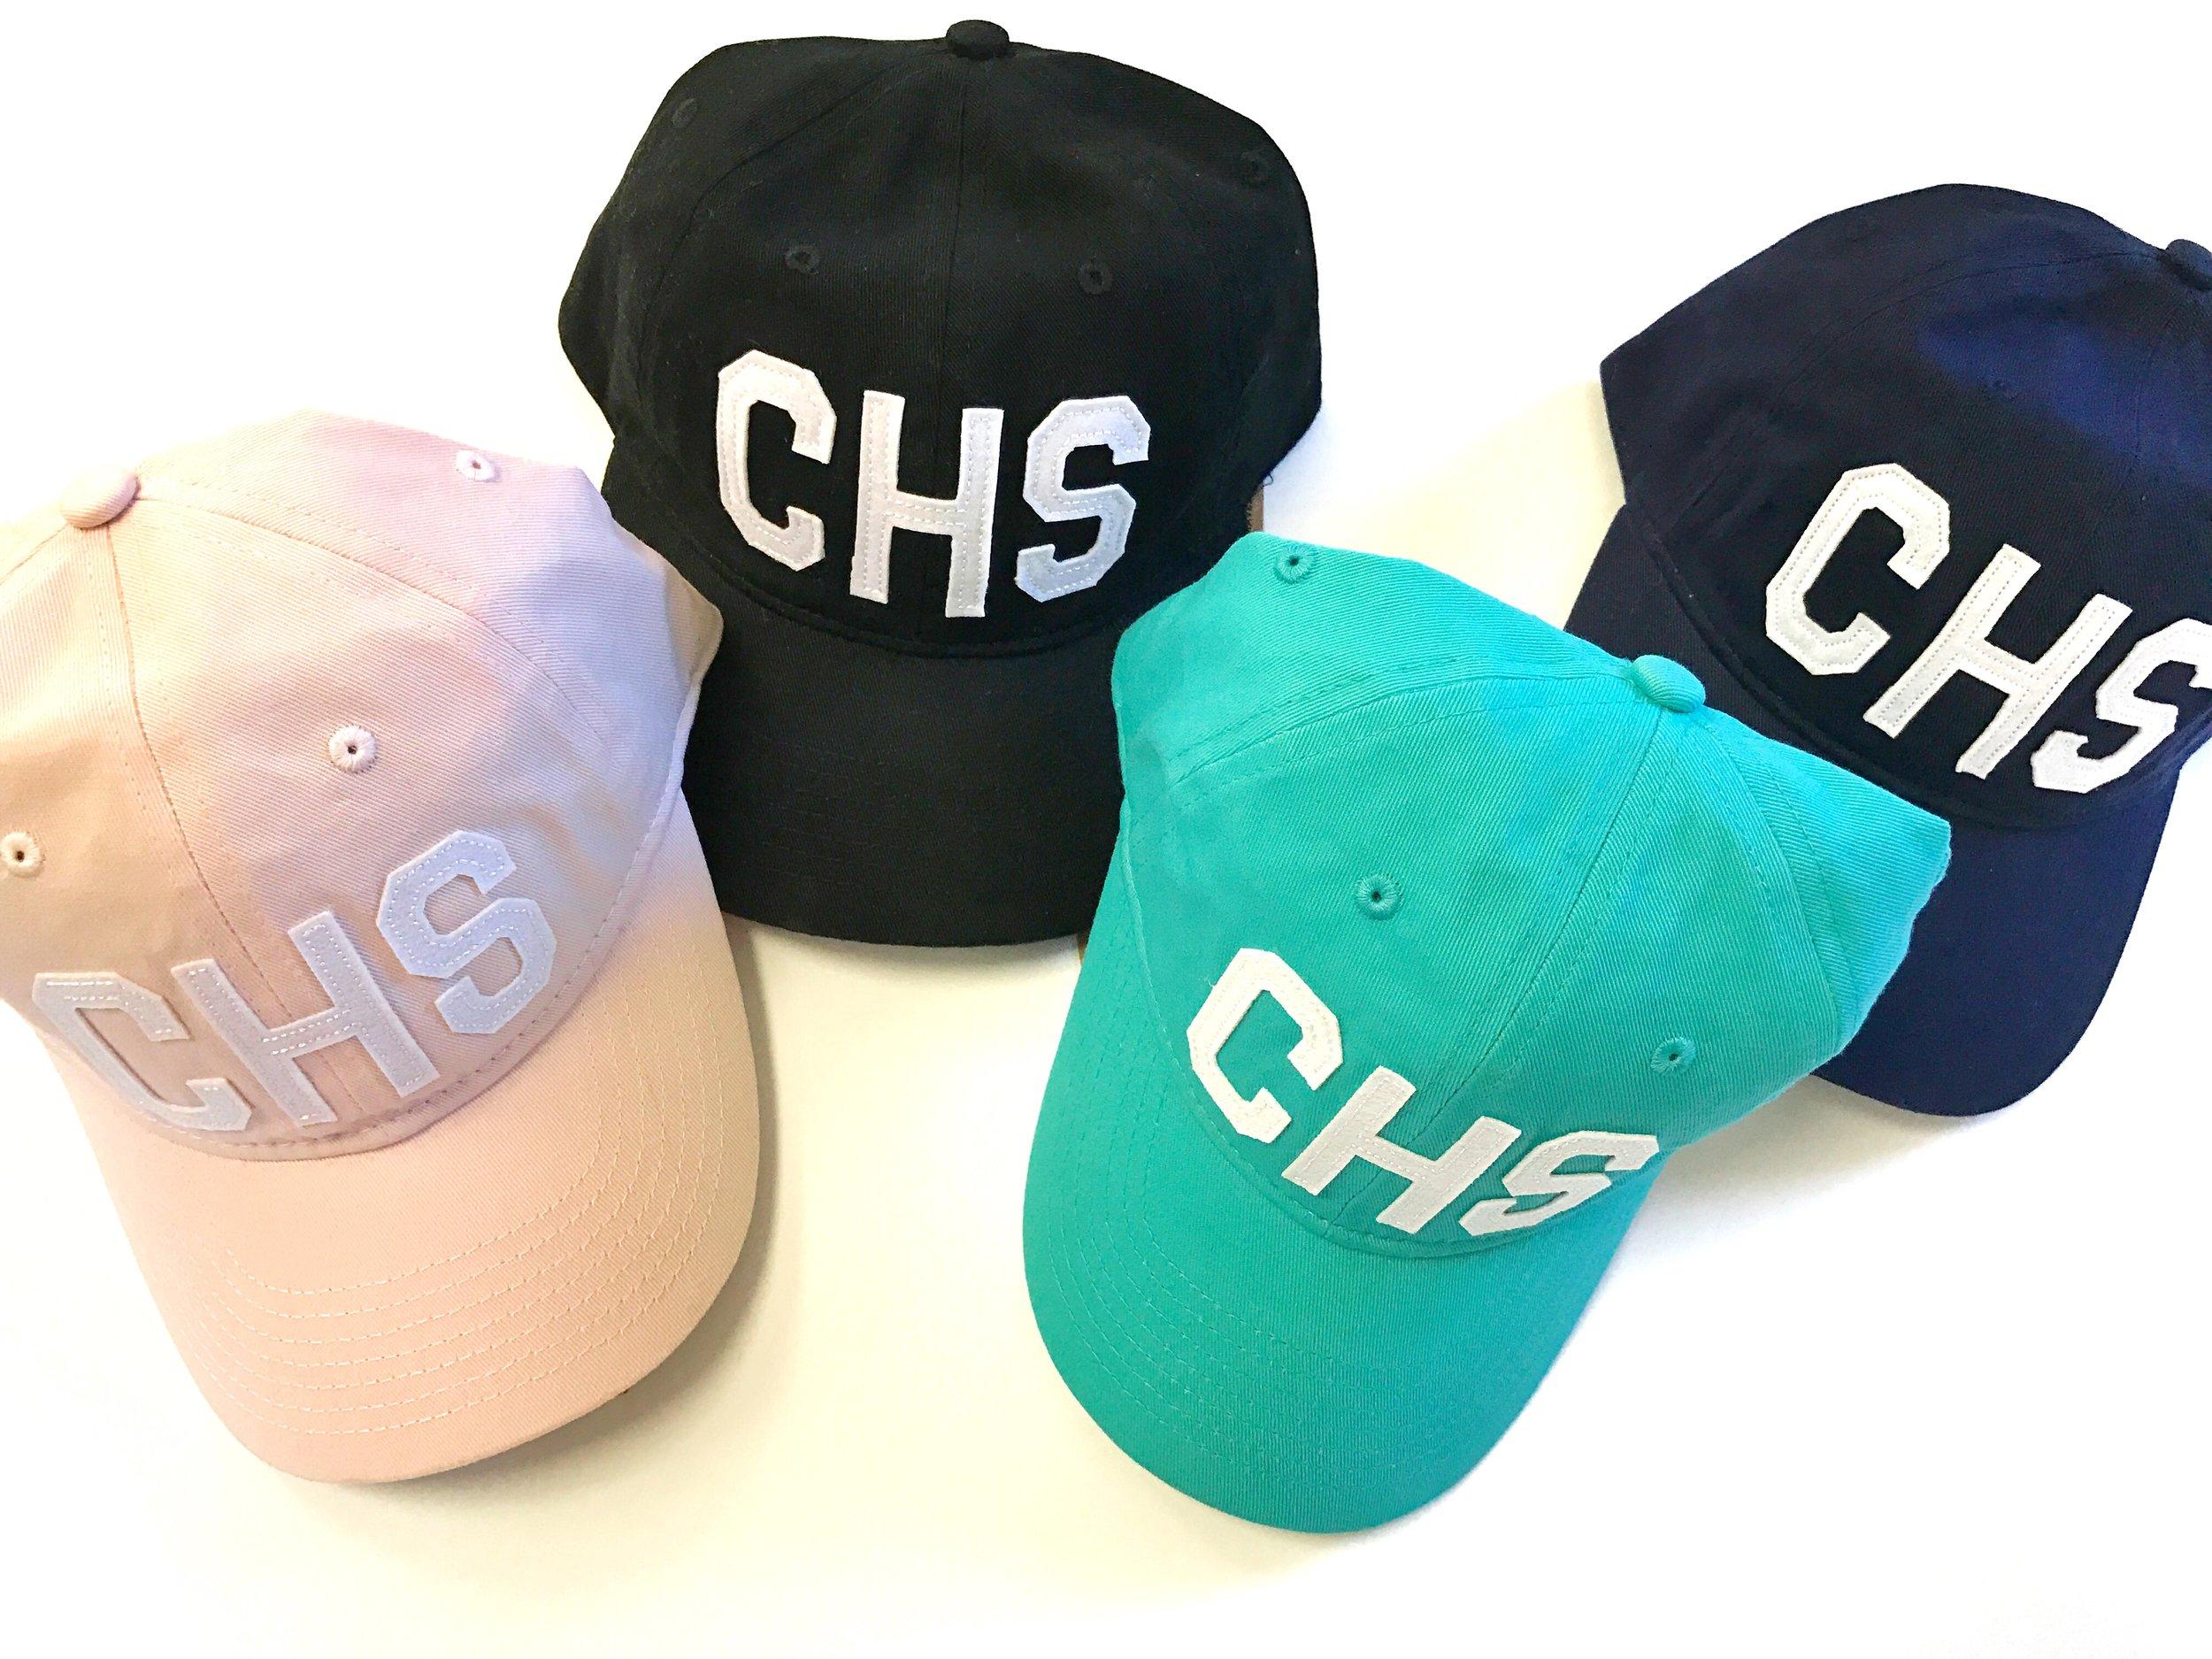 CHS Aviate Hats, $35